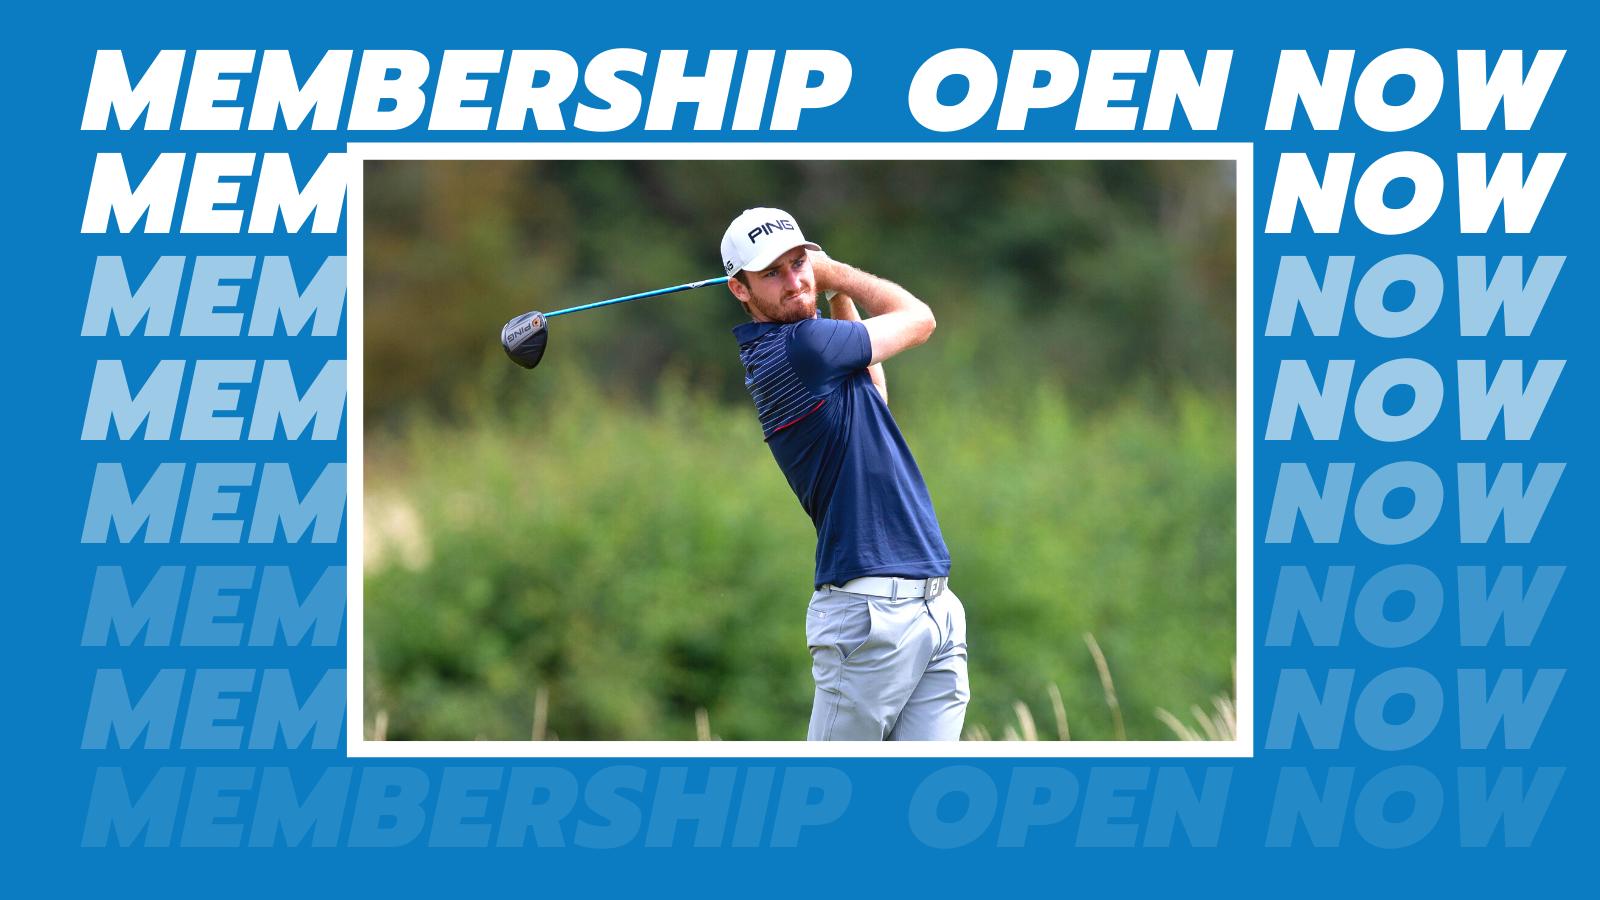 Membership for 2021 season now open